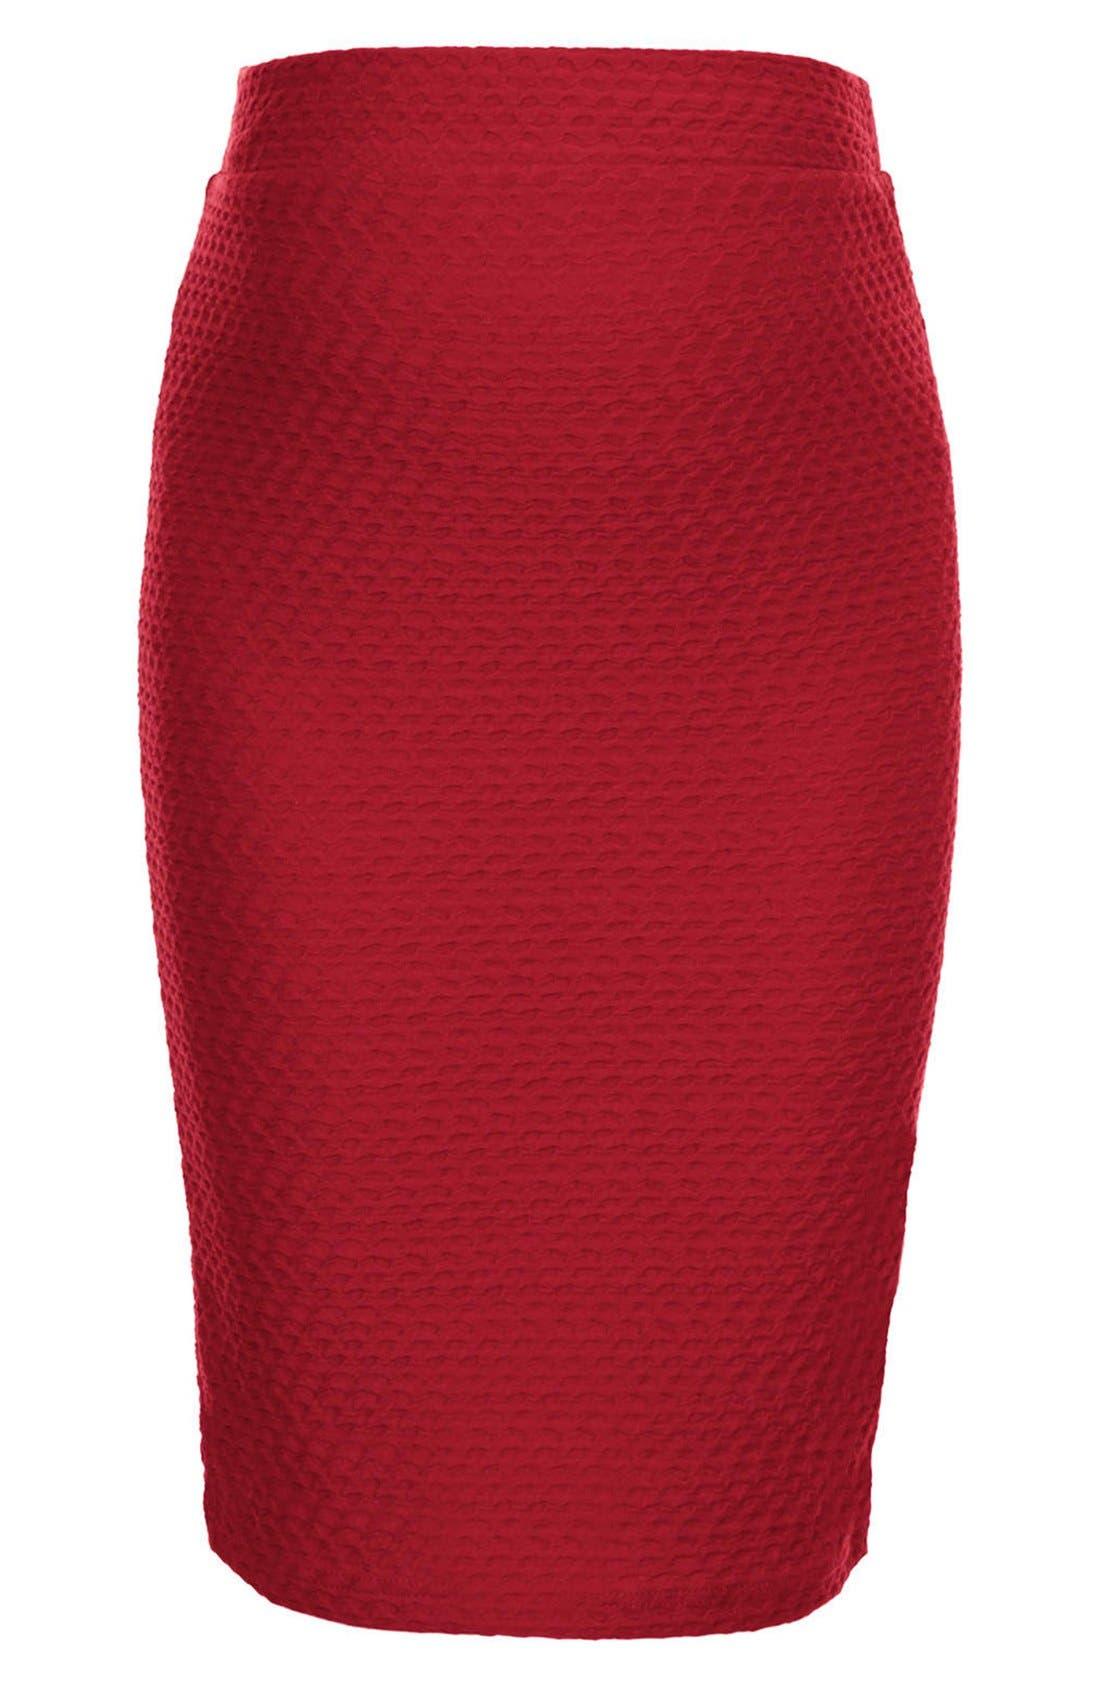 Alternate Image 3  - Topshop Chevron Texture Maternity Tube Skirt